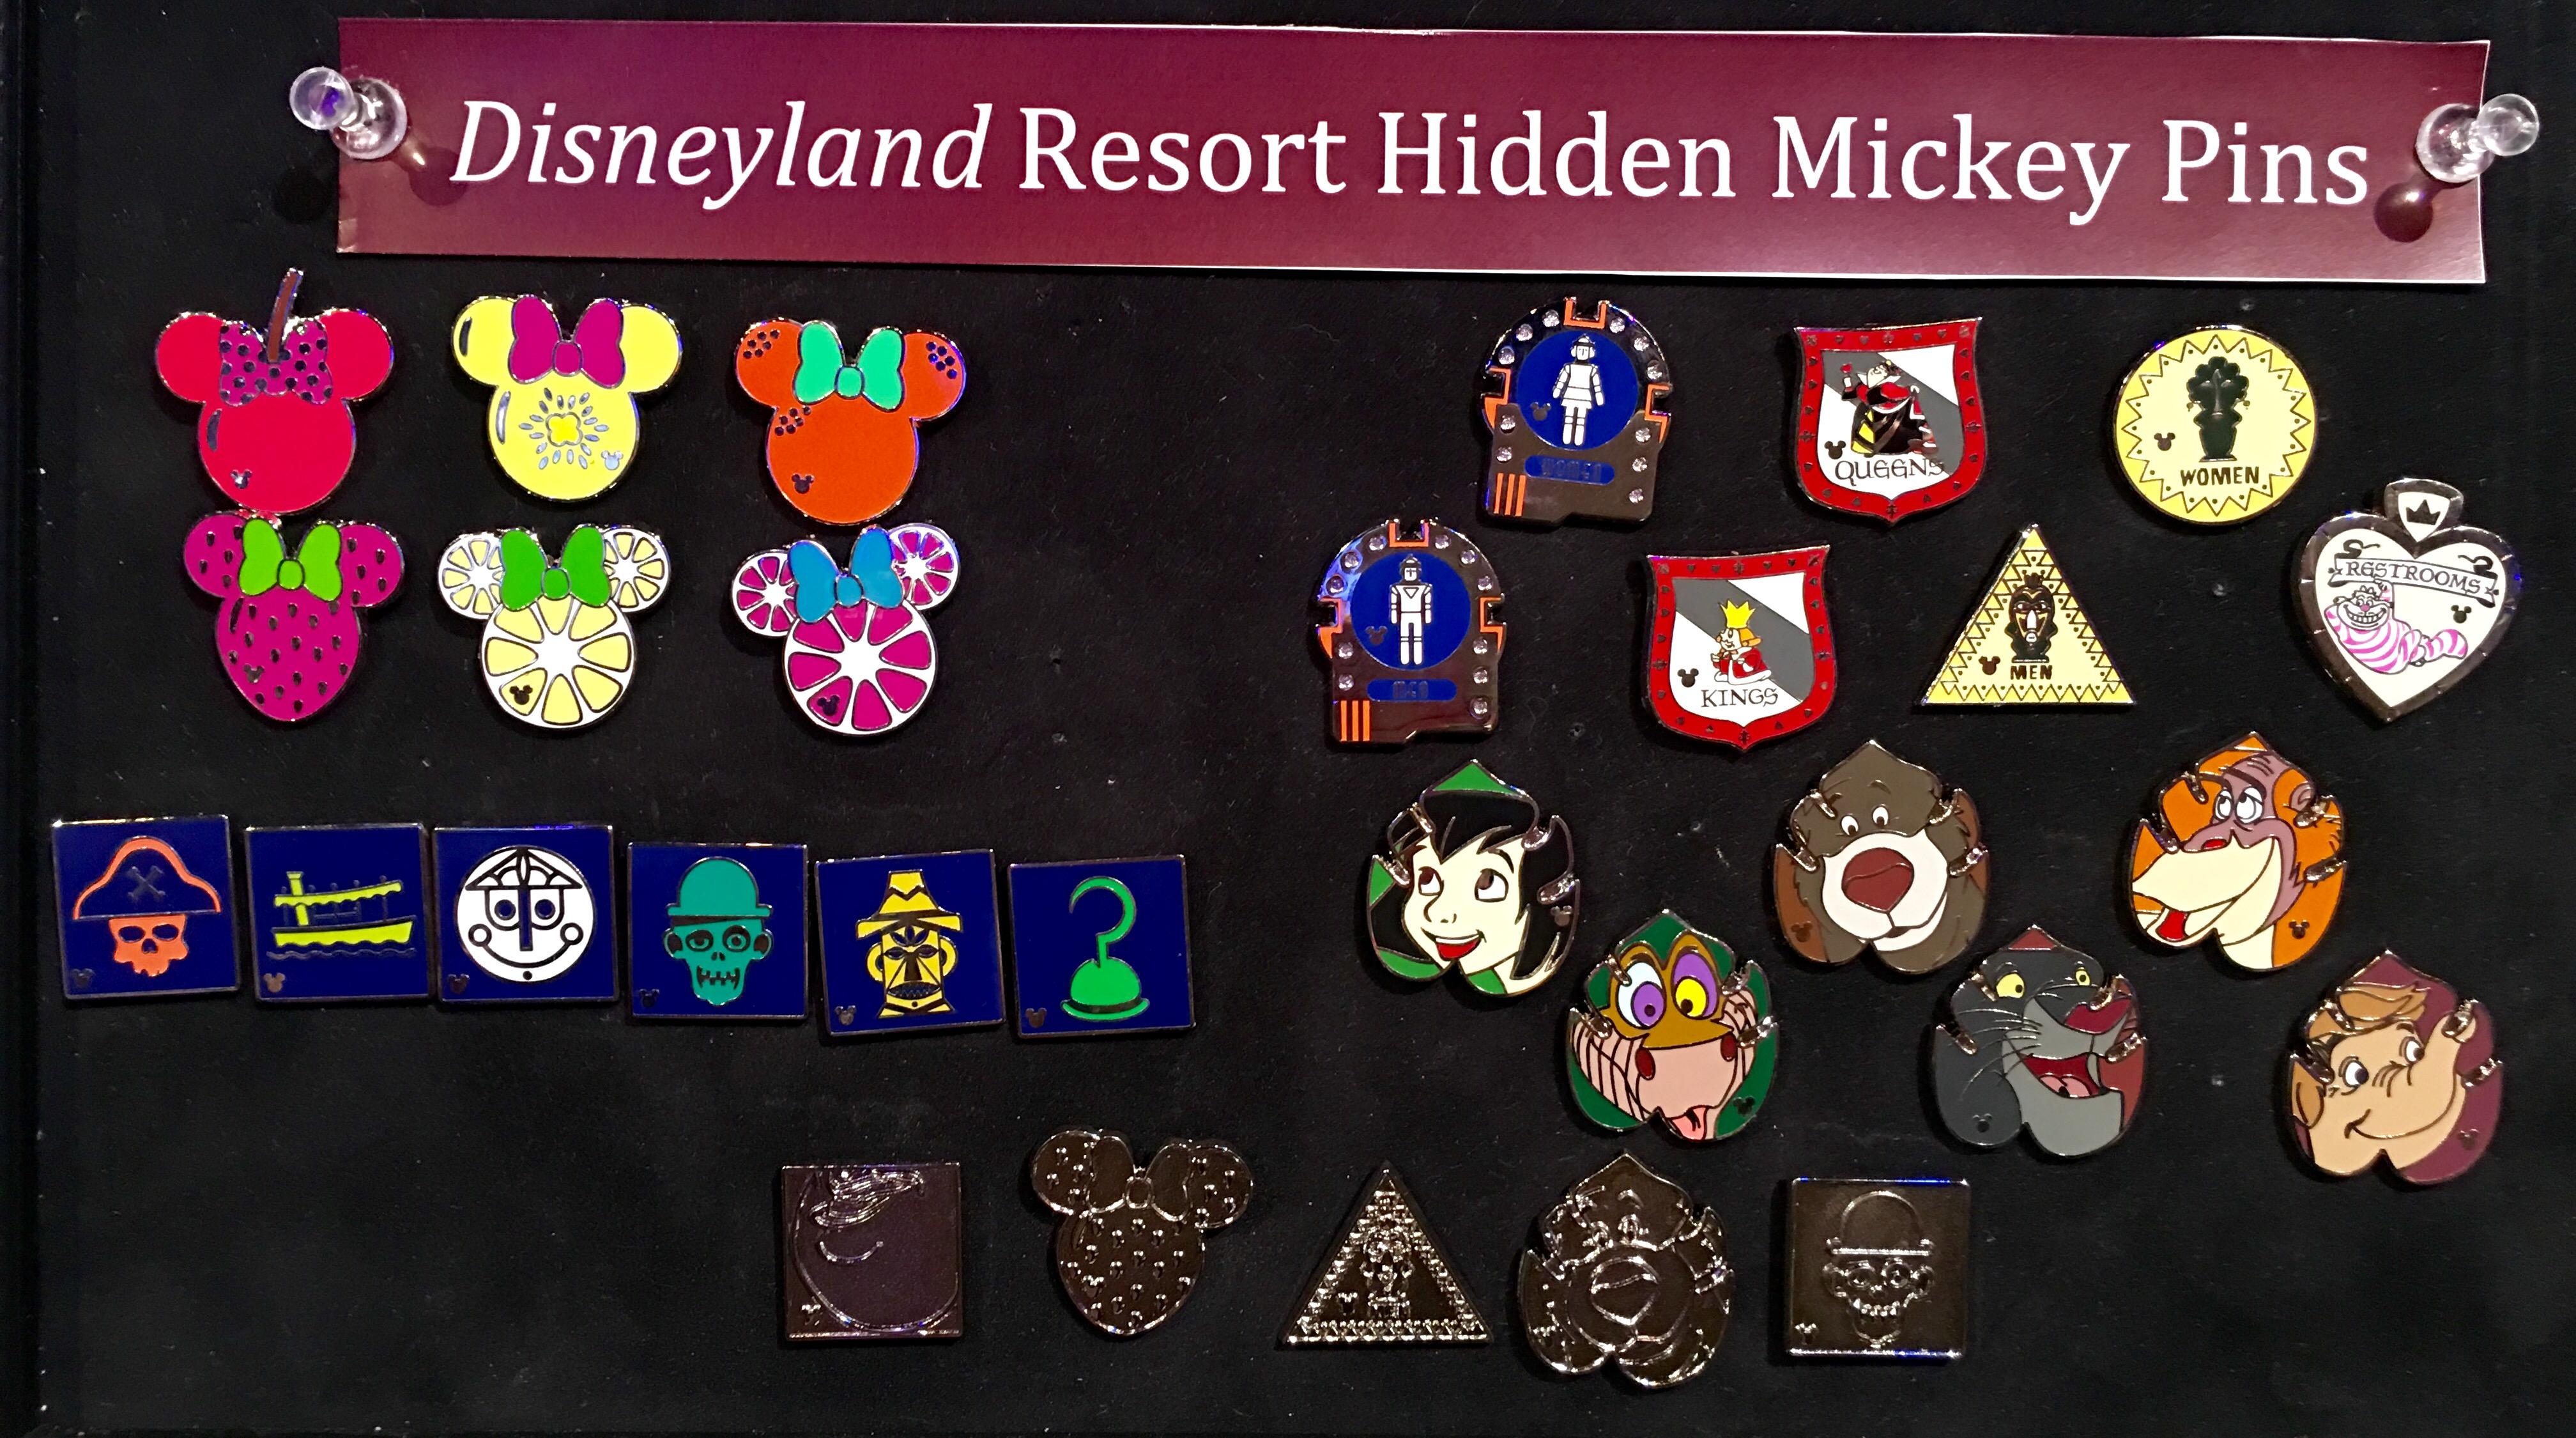 Disney Pins Alice In Wonderland 2018 Hidden Mickeys 7 Pin Set With COMPLETER